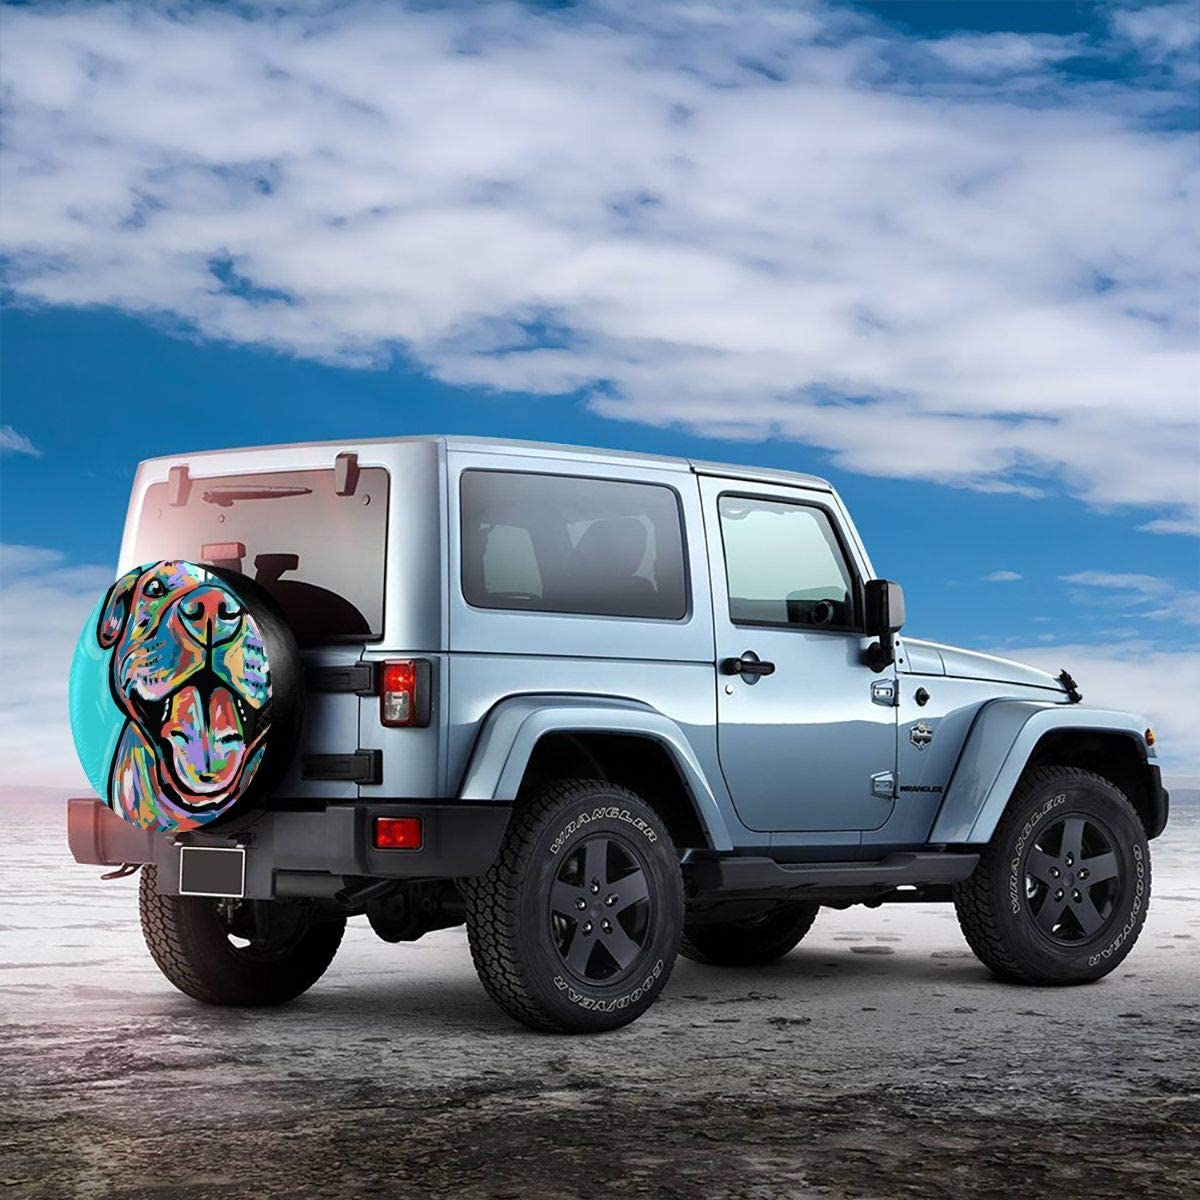 14-17 Inch Wheel Tire Covers Fits Jeep Wrangler CRV FJ RAV4 Land Rover Discovery EcoSport TAOHJSJ34 Real Men Wear Kilts Waterproof Universal Spare Tire Cover